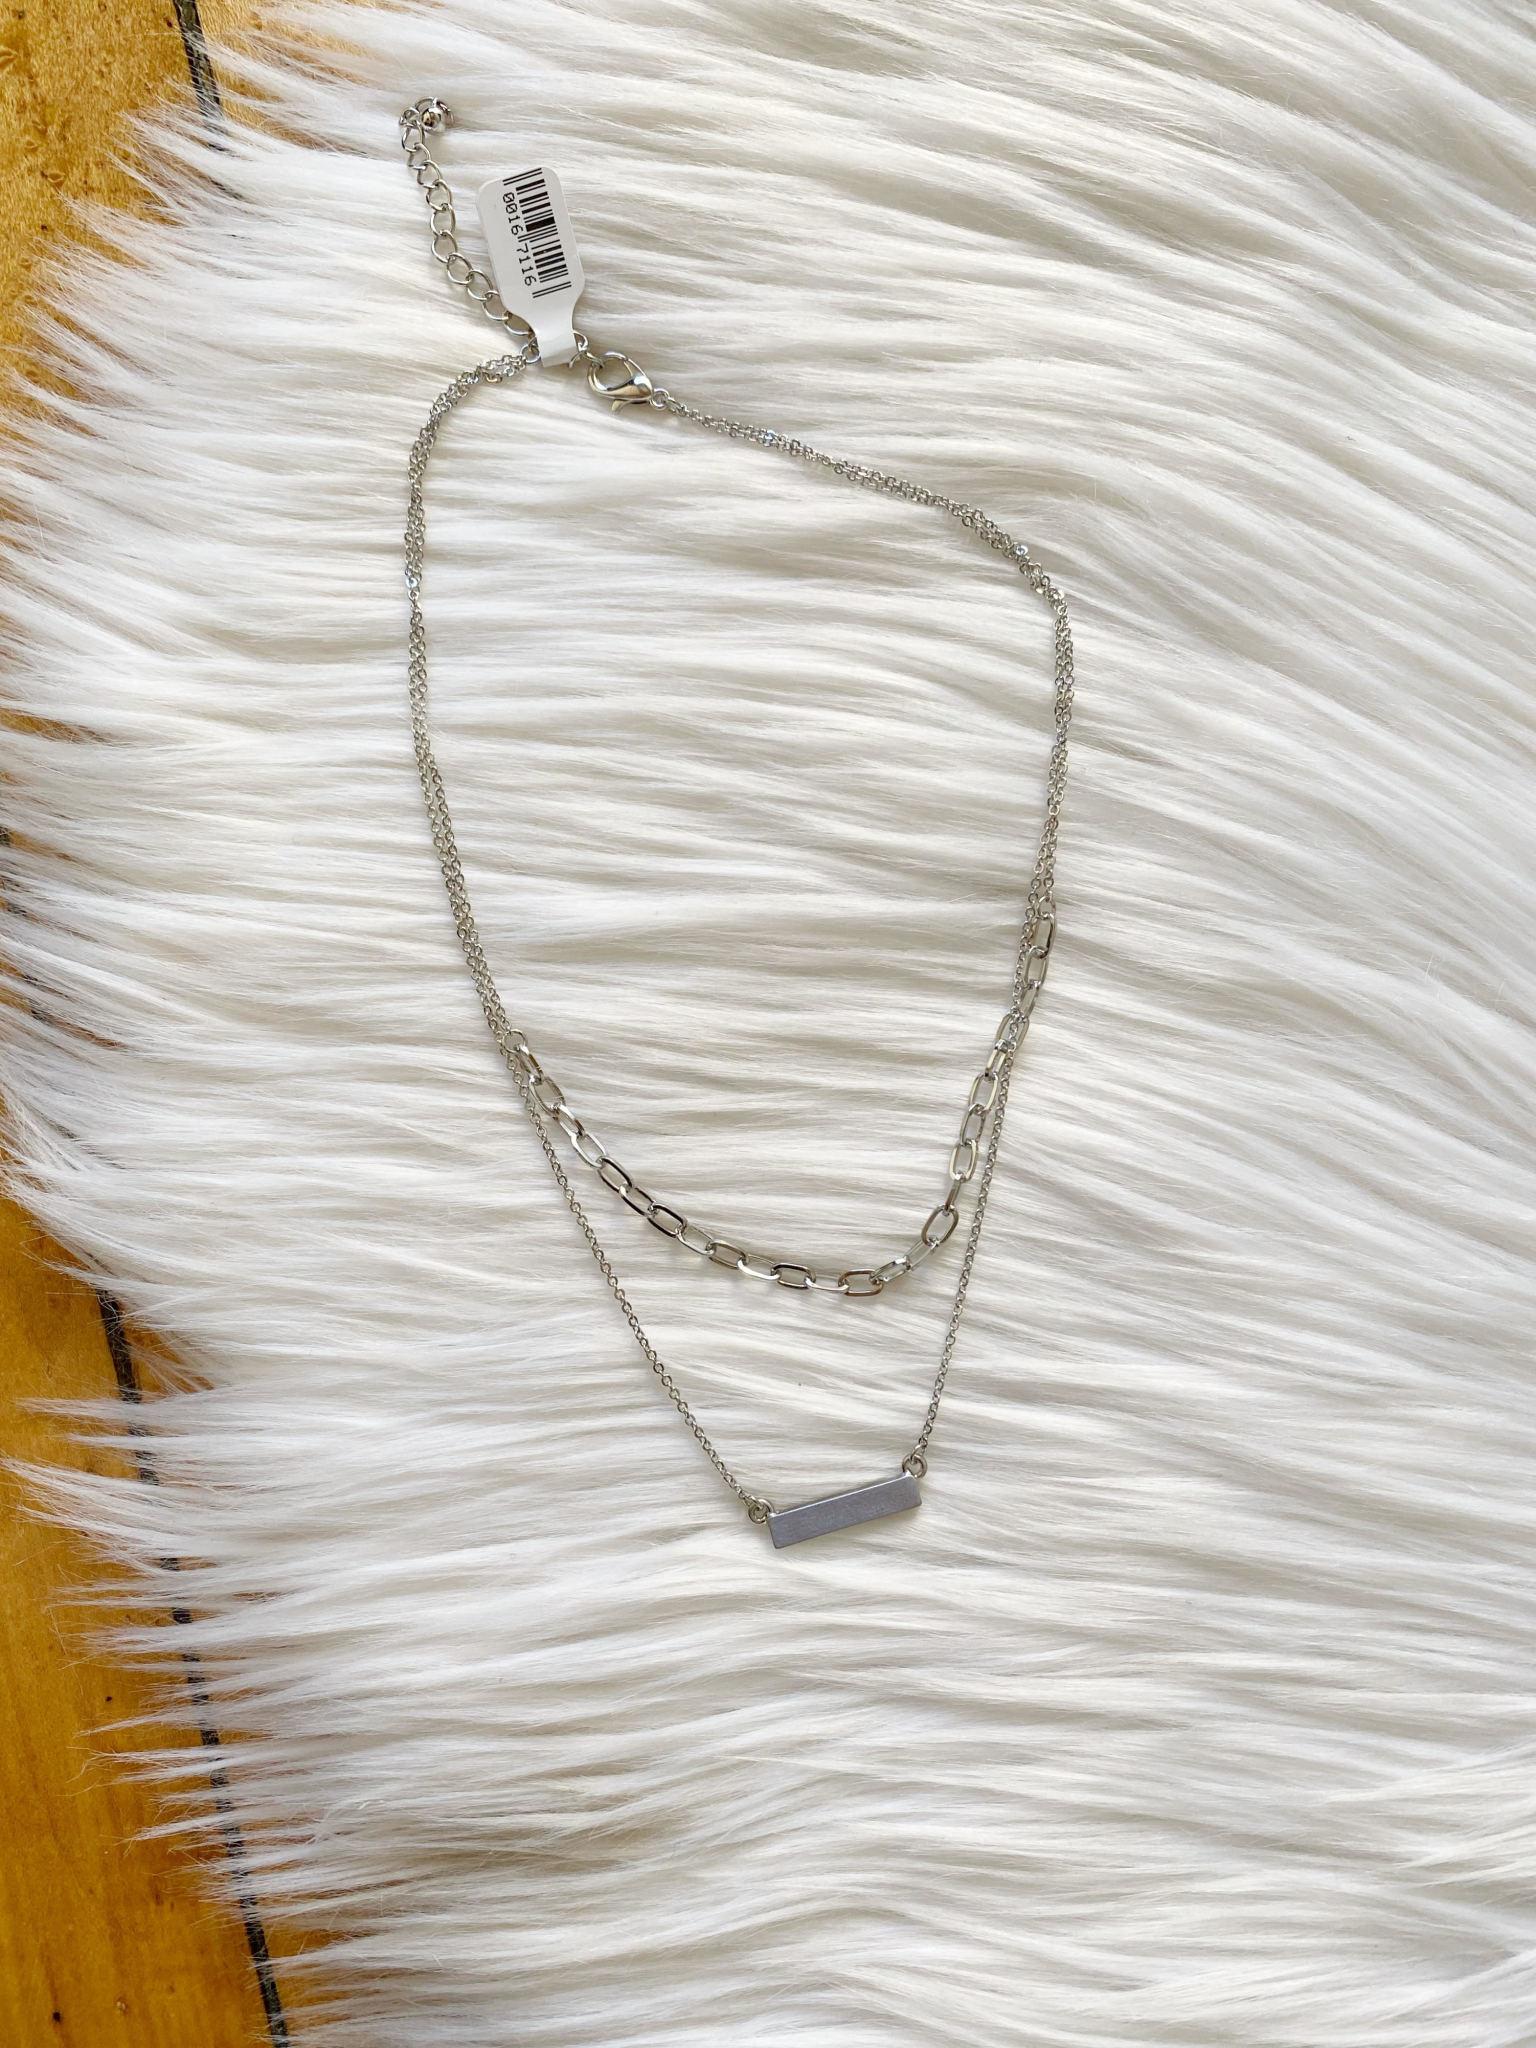 Chain + Bar Layered Necklace